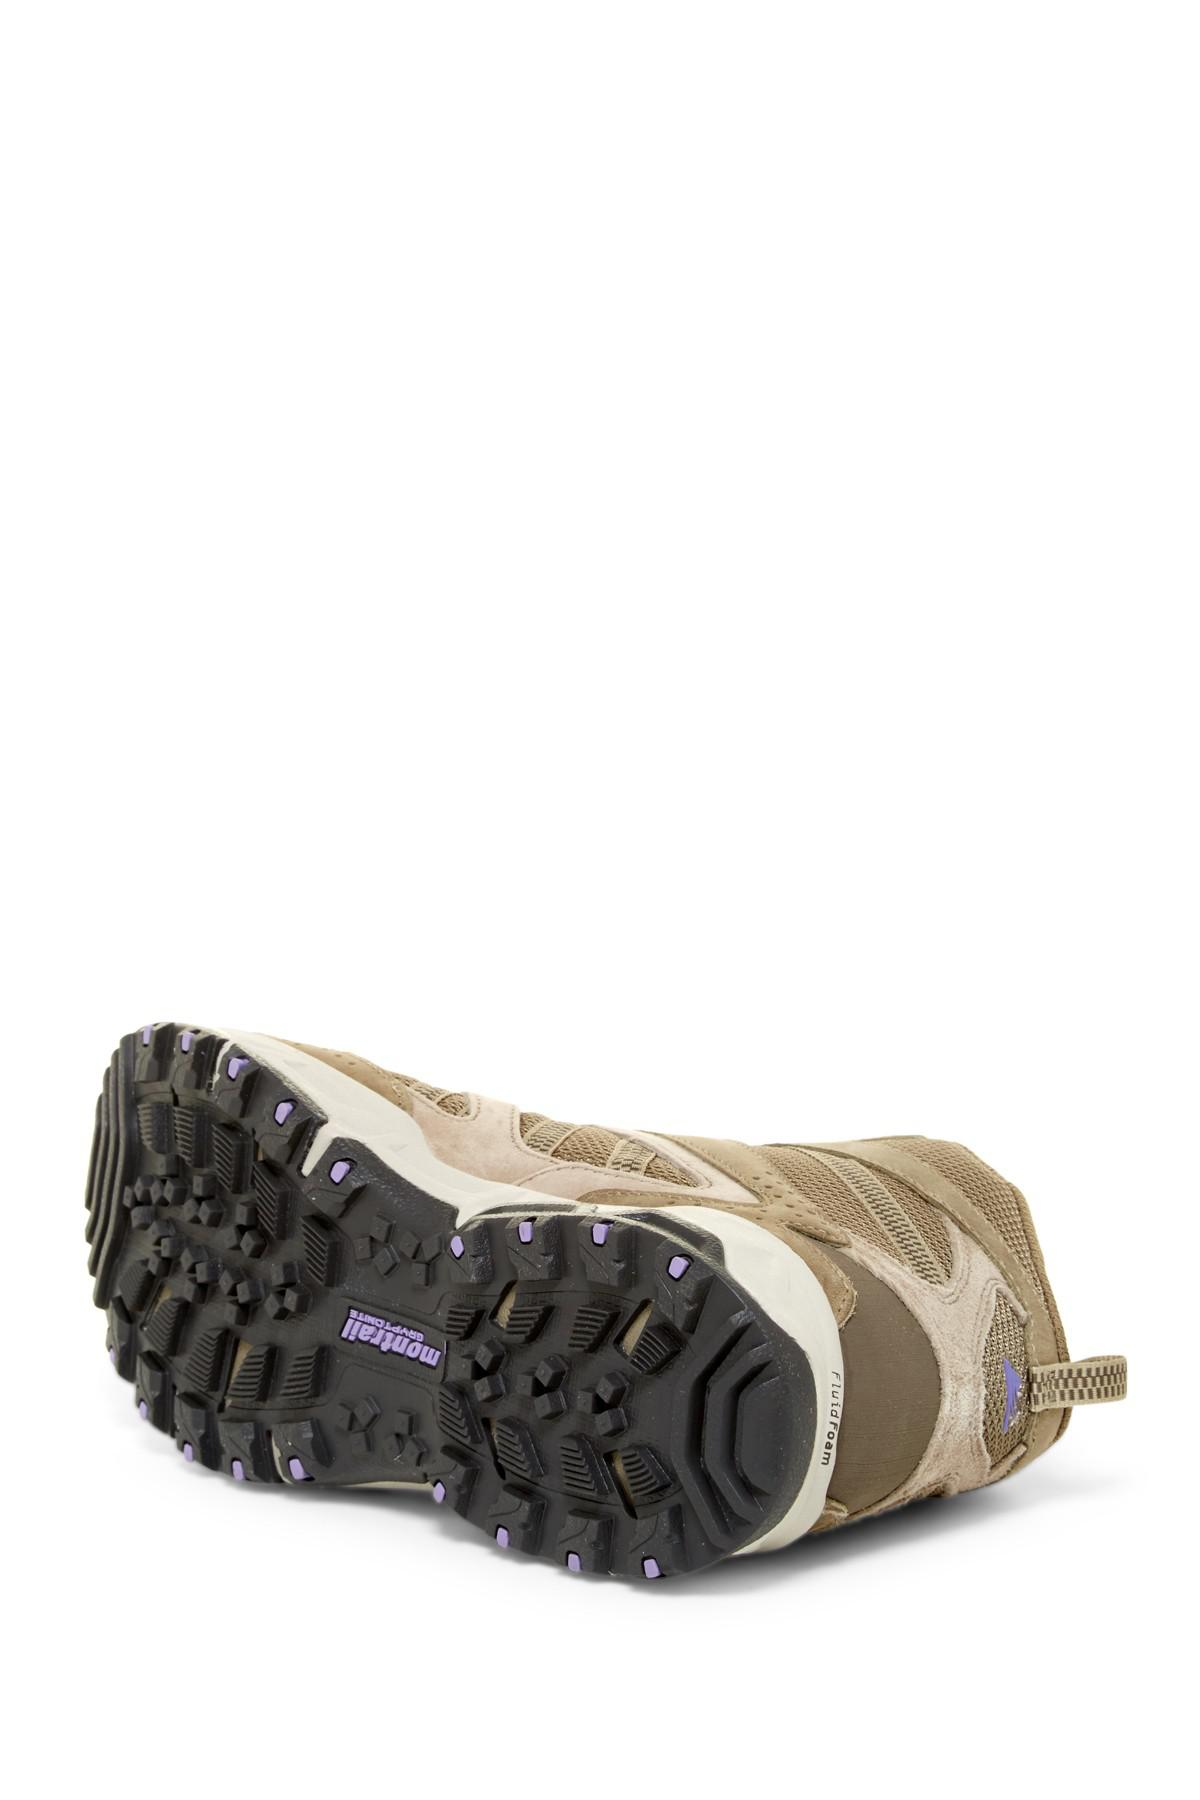 70d05b3793e Montrail Sierravada Mid Outdry Trail Sneaker - Lyst